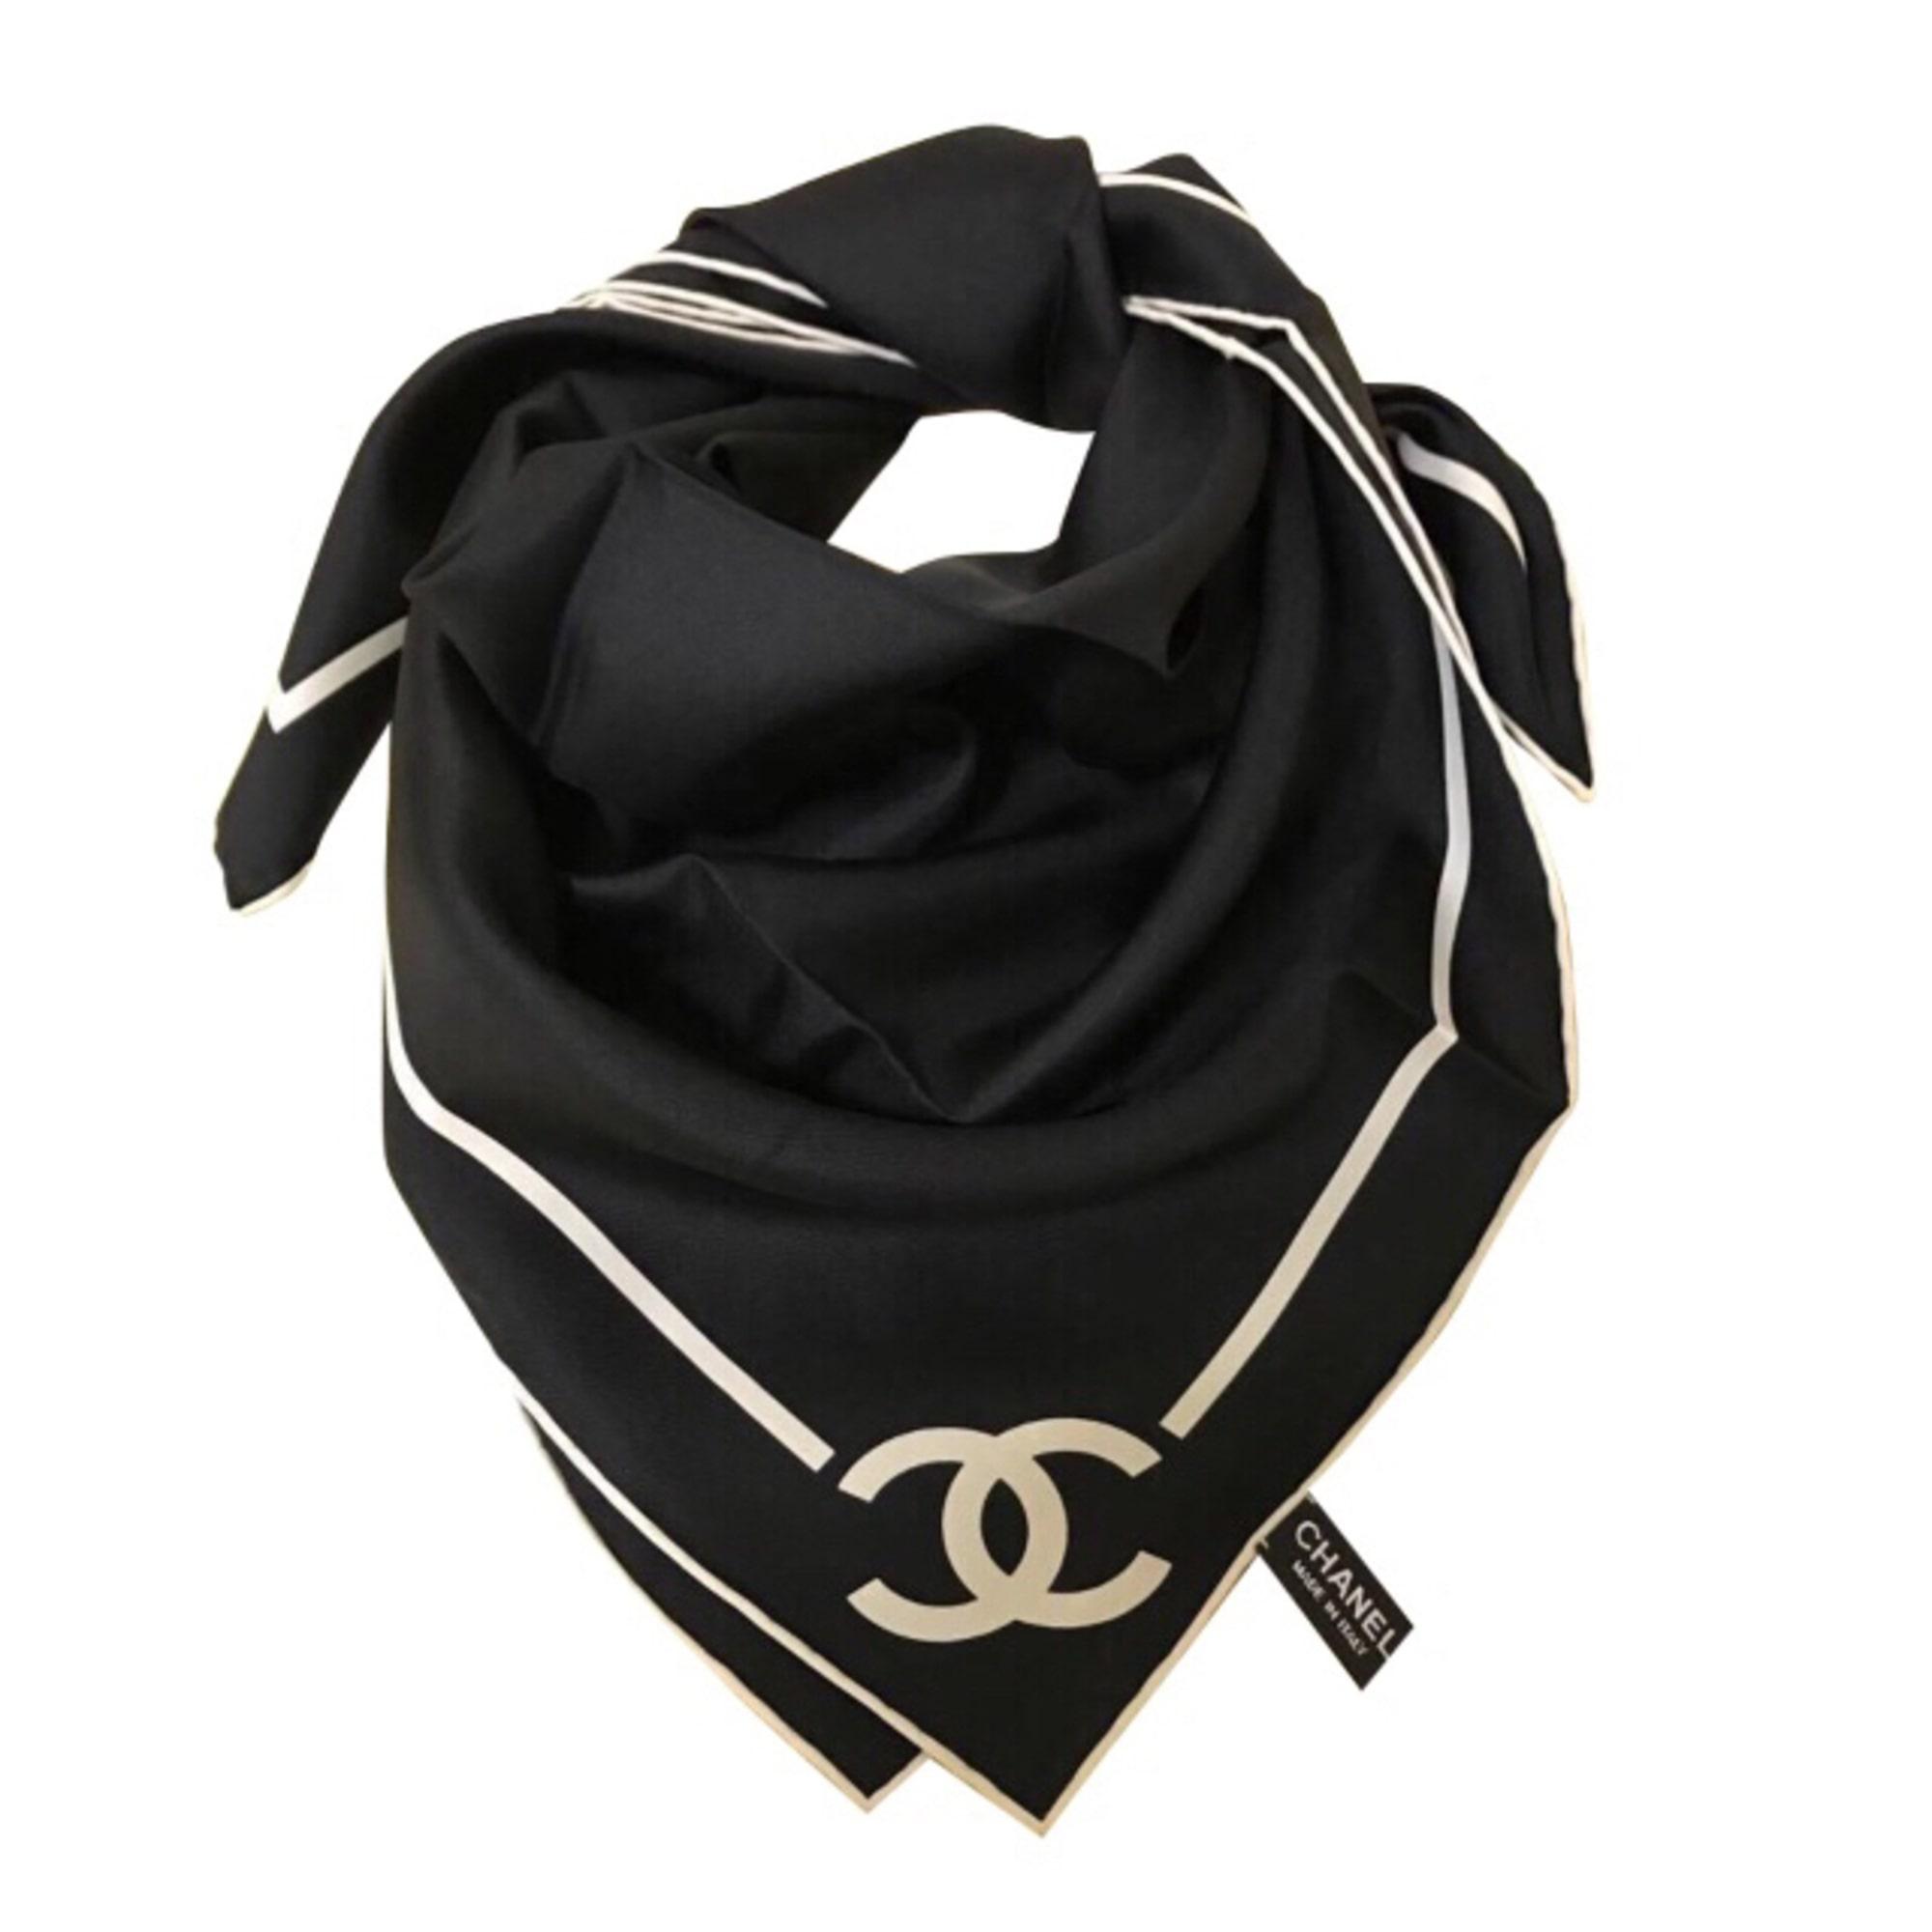 Foulard CHANEL noir vendu par Nastykirl82763 - 7837262 39c4476e758